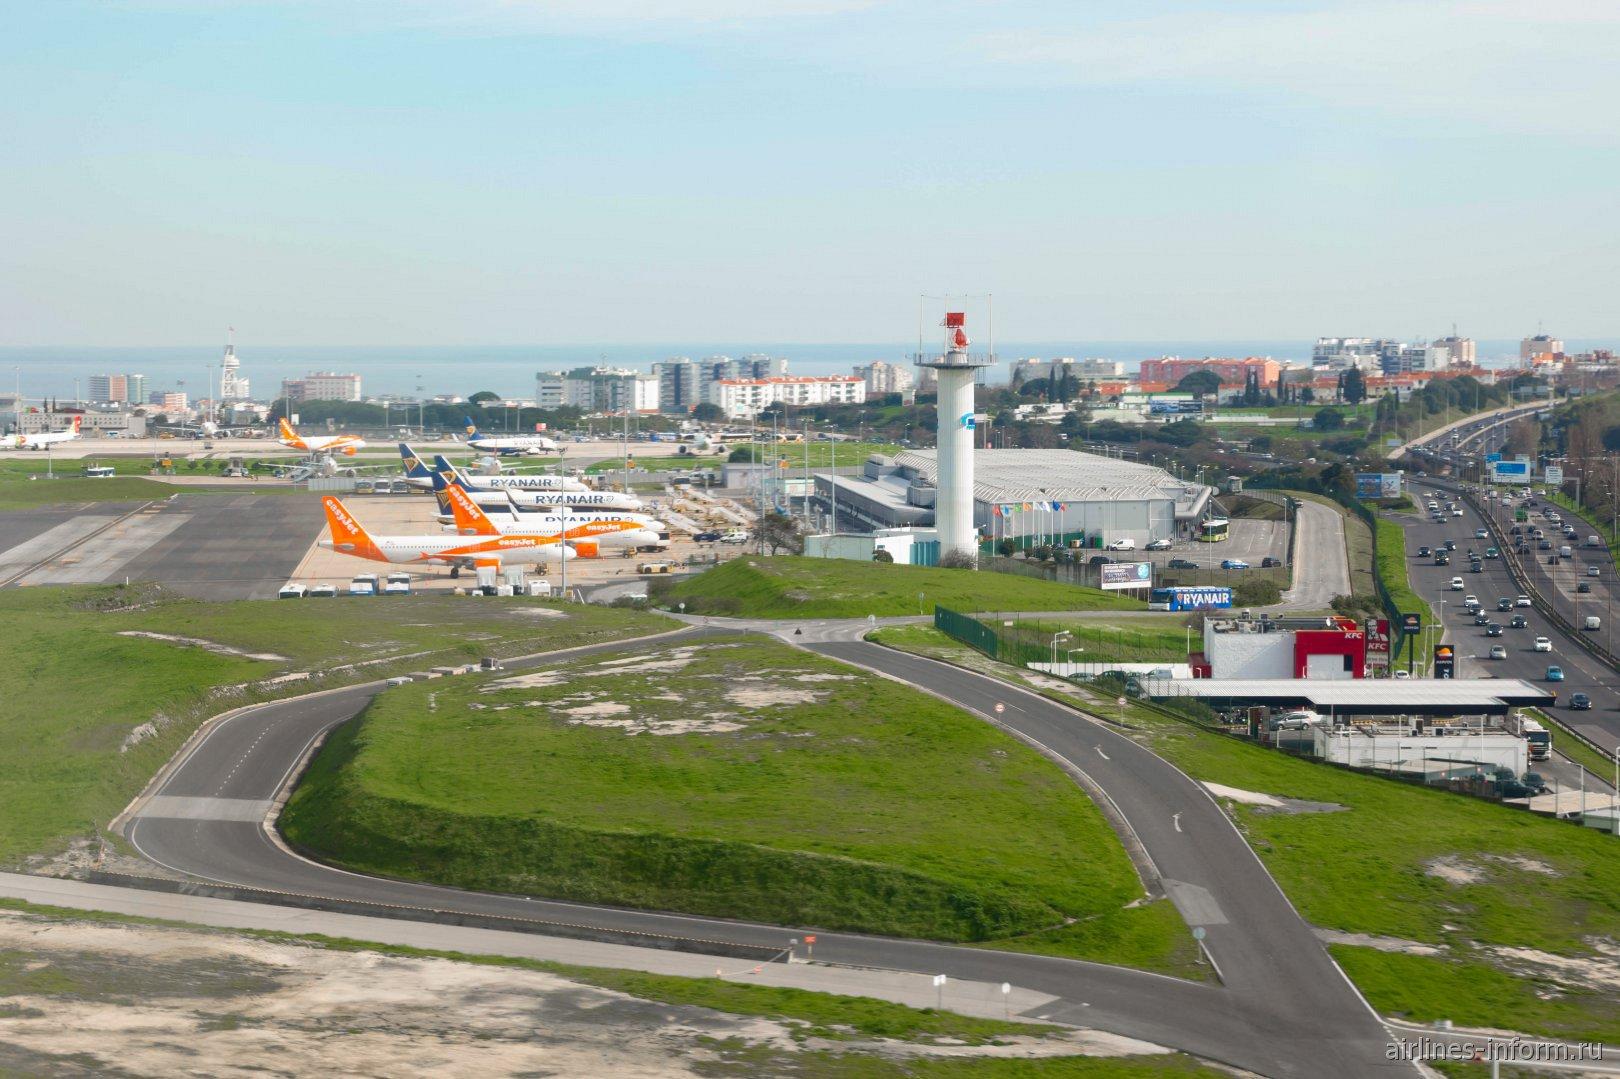 Вид на терминал Т2 бюджетных авиалиний в аэропорту Лиссабона